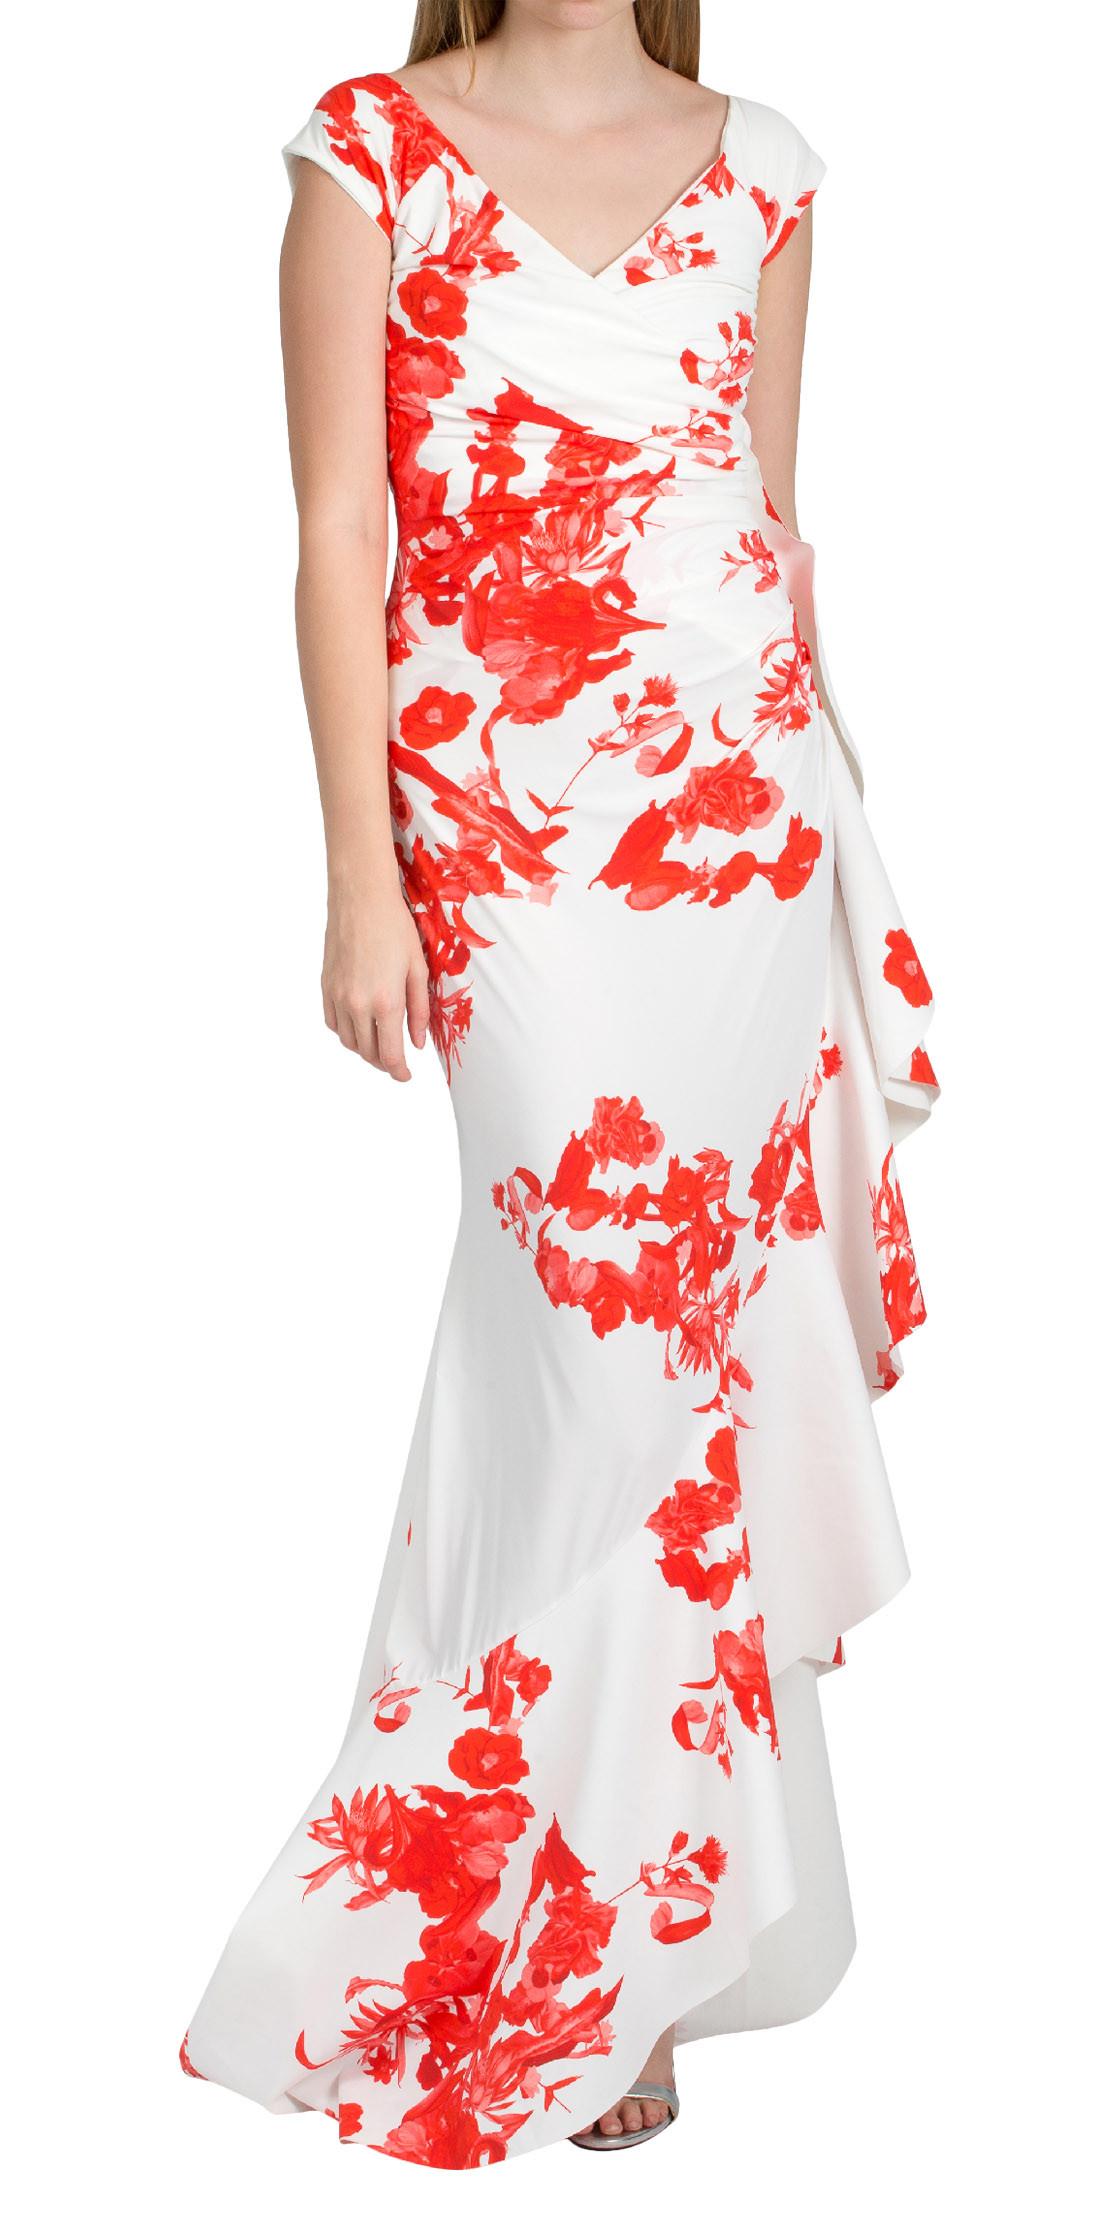 6b53f578fe58 La Petite Robe di Chiara Boni Floral Print Wrap Dress | Evening ...